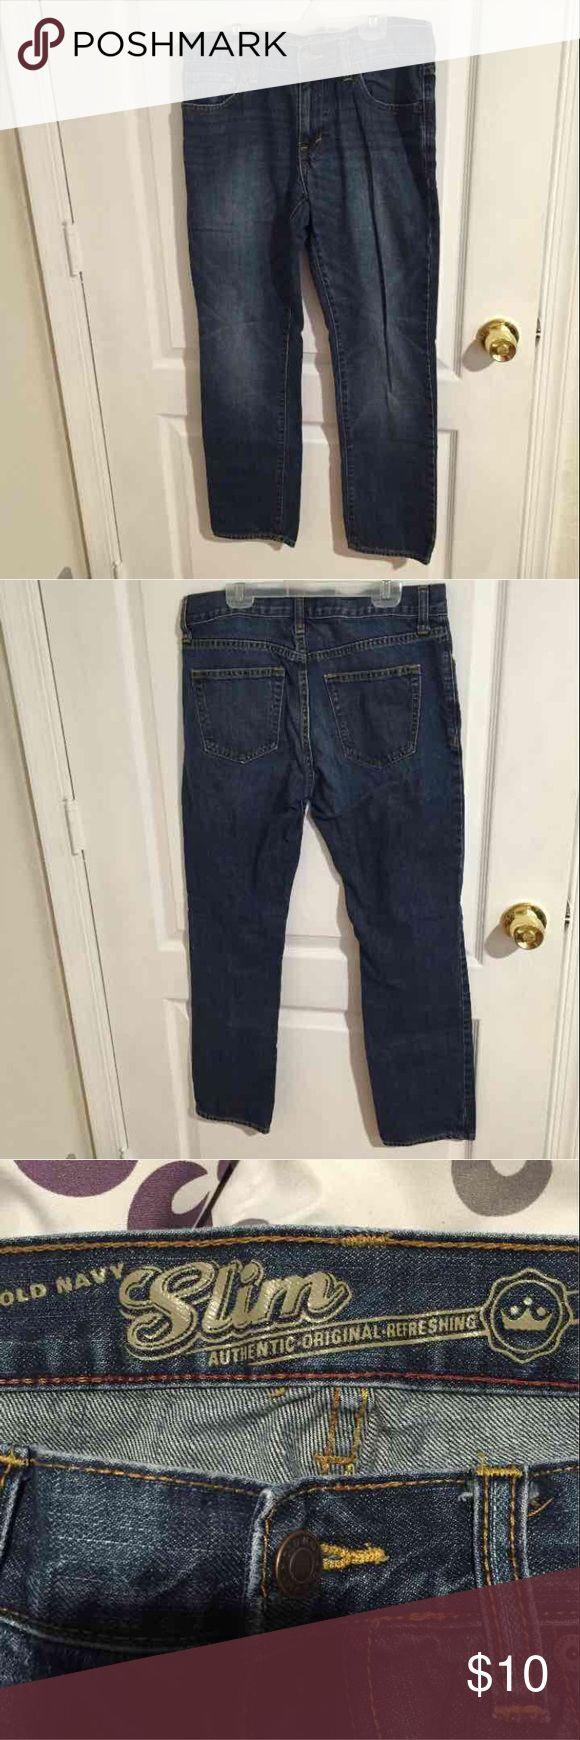 Old Navy Men's Slim Jean Size 30X30 Old Navy men's slim fit jean. Size 30X30 never worn. Old Navy Jeans Slim